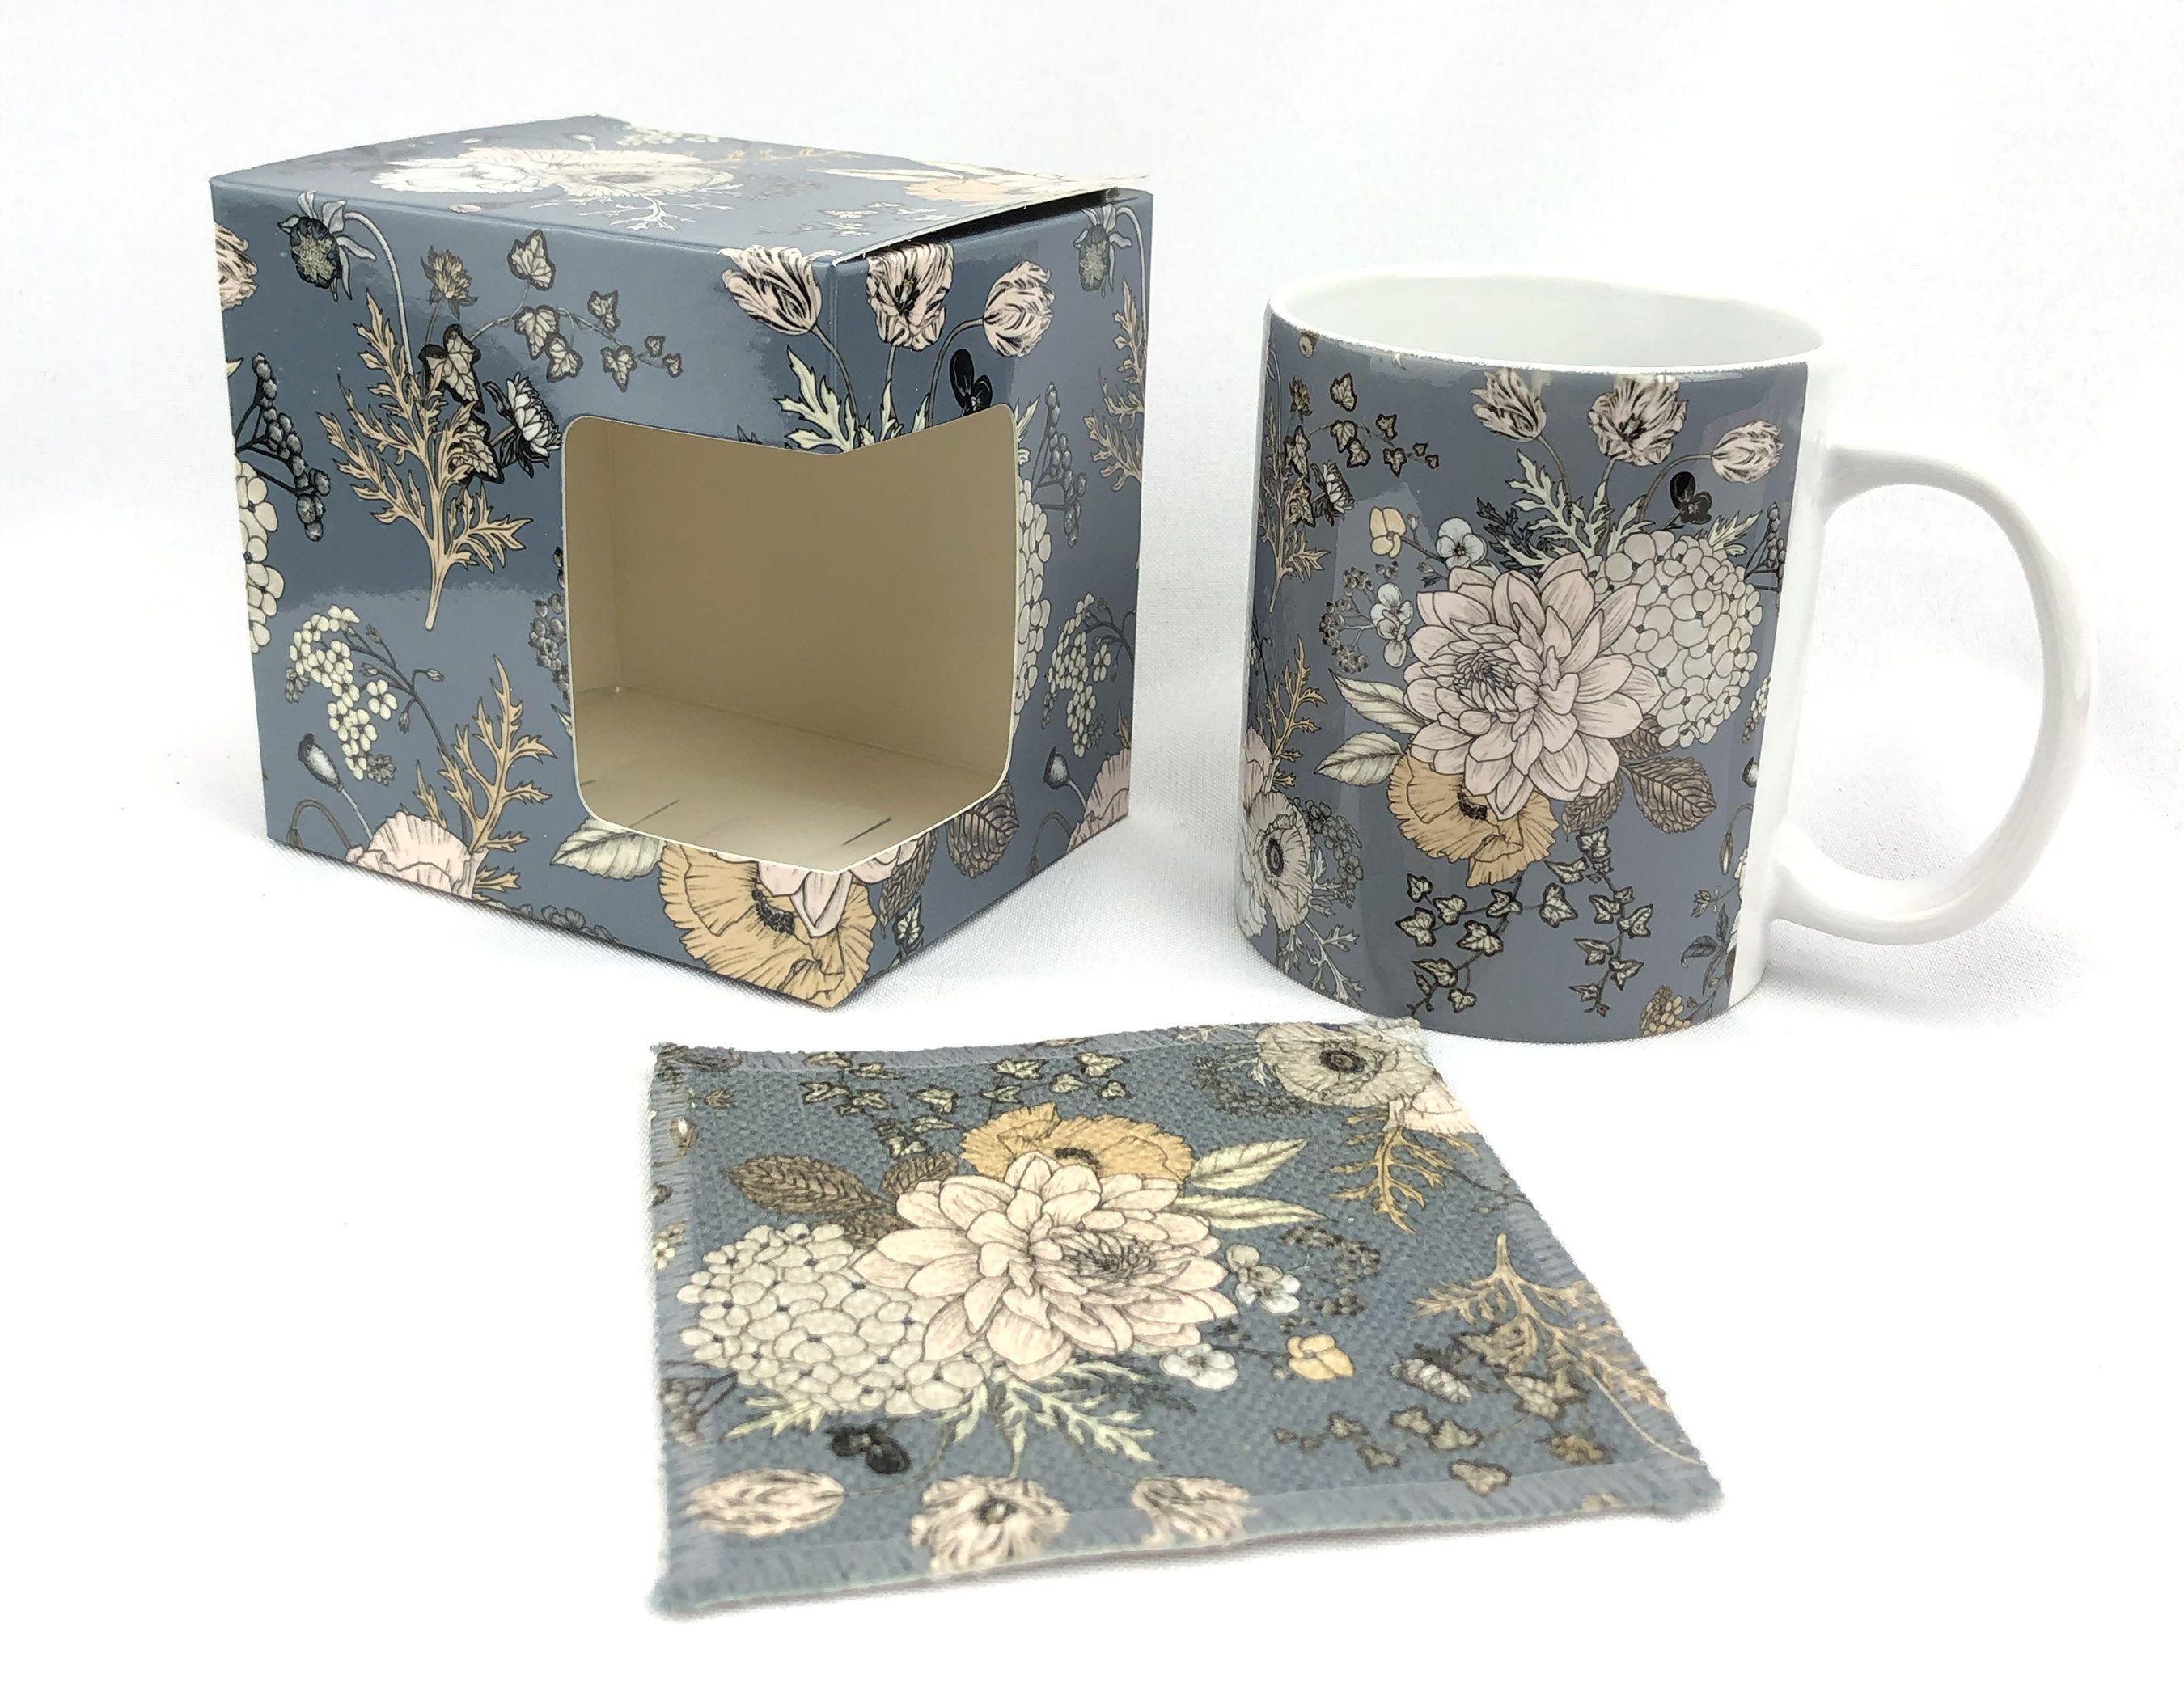 Floral Ceramic 11 oz. Coffee Mug, Gift Box & Coaster